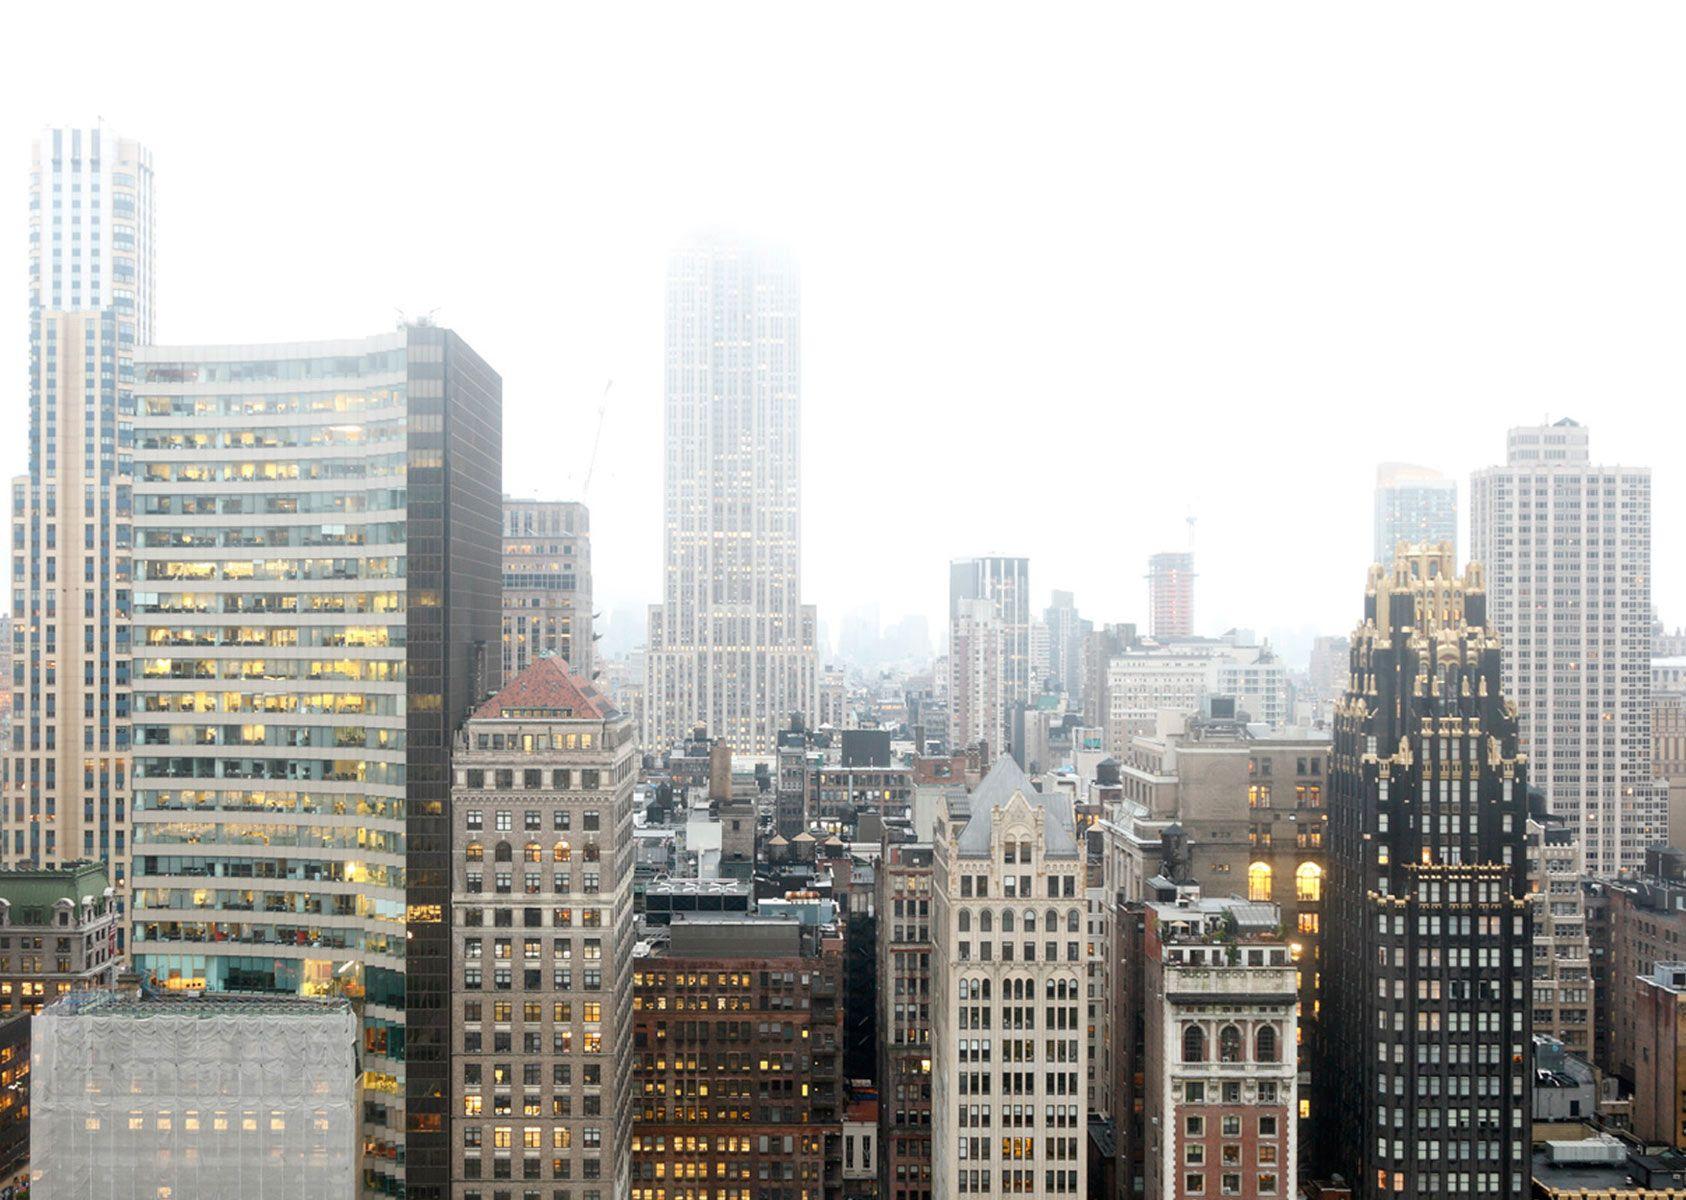 cityscape. Adrian Wilson (photographer)